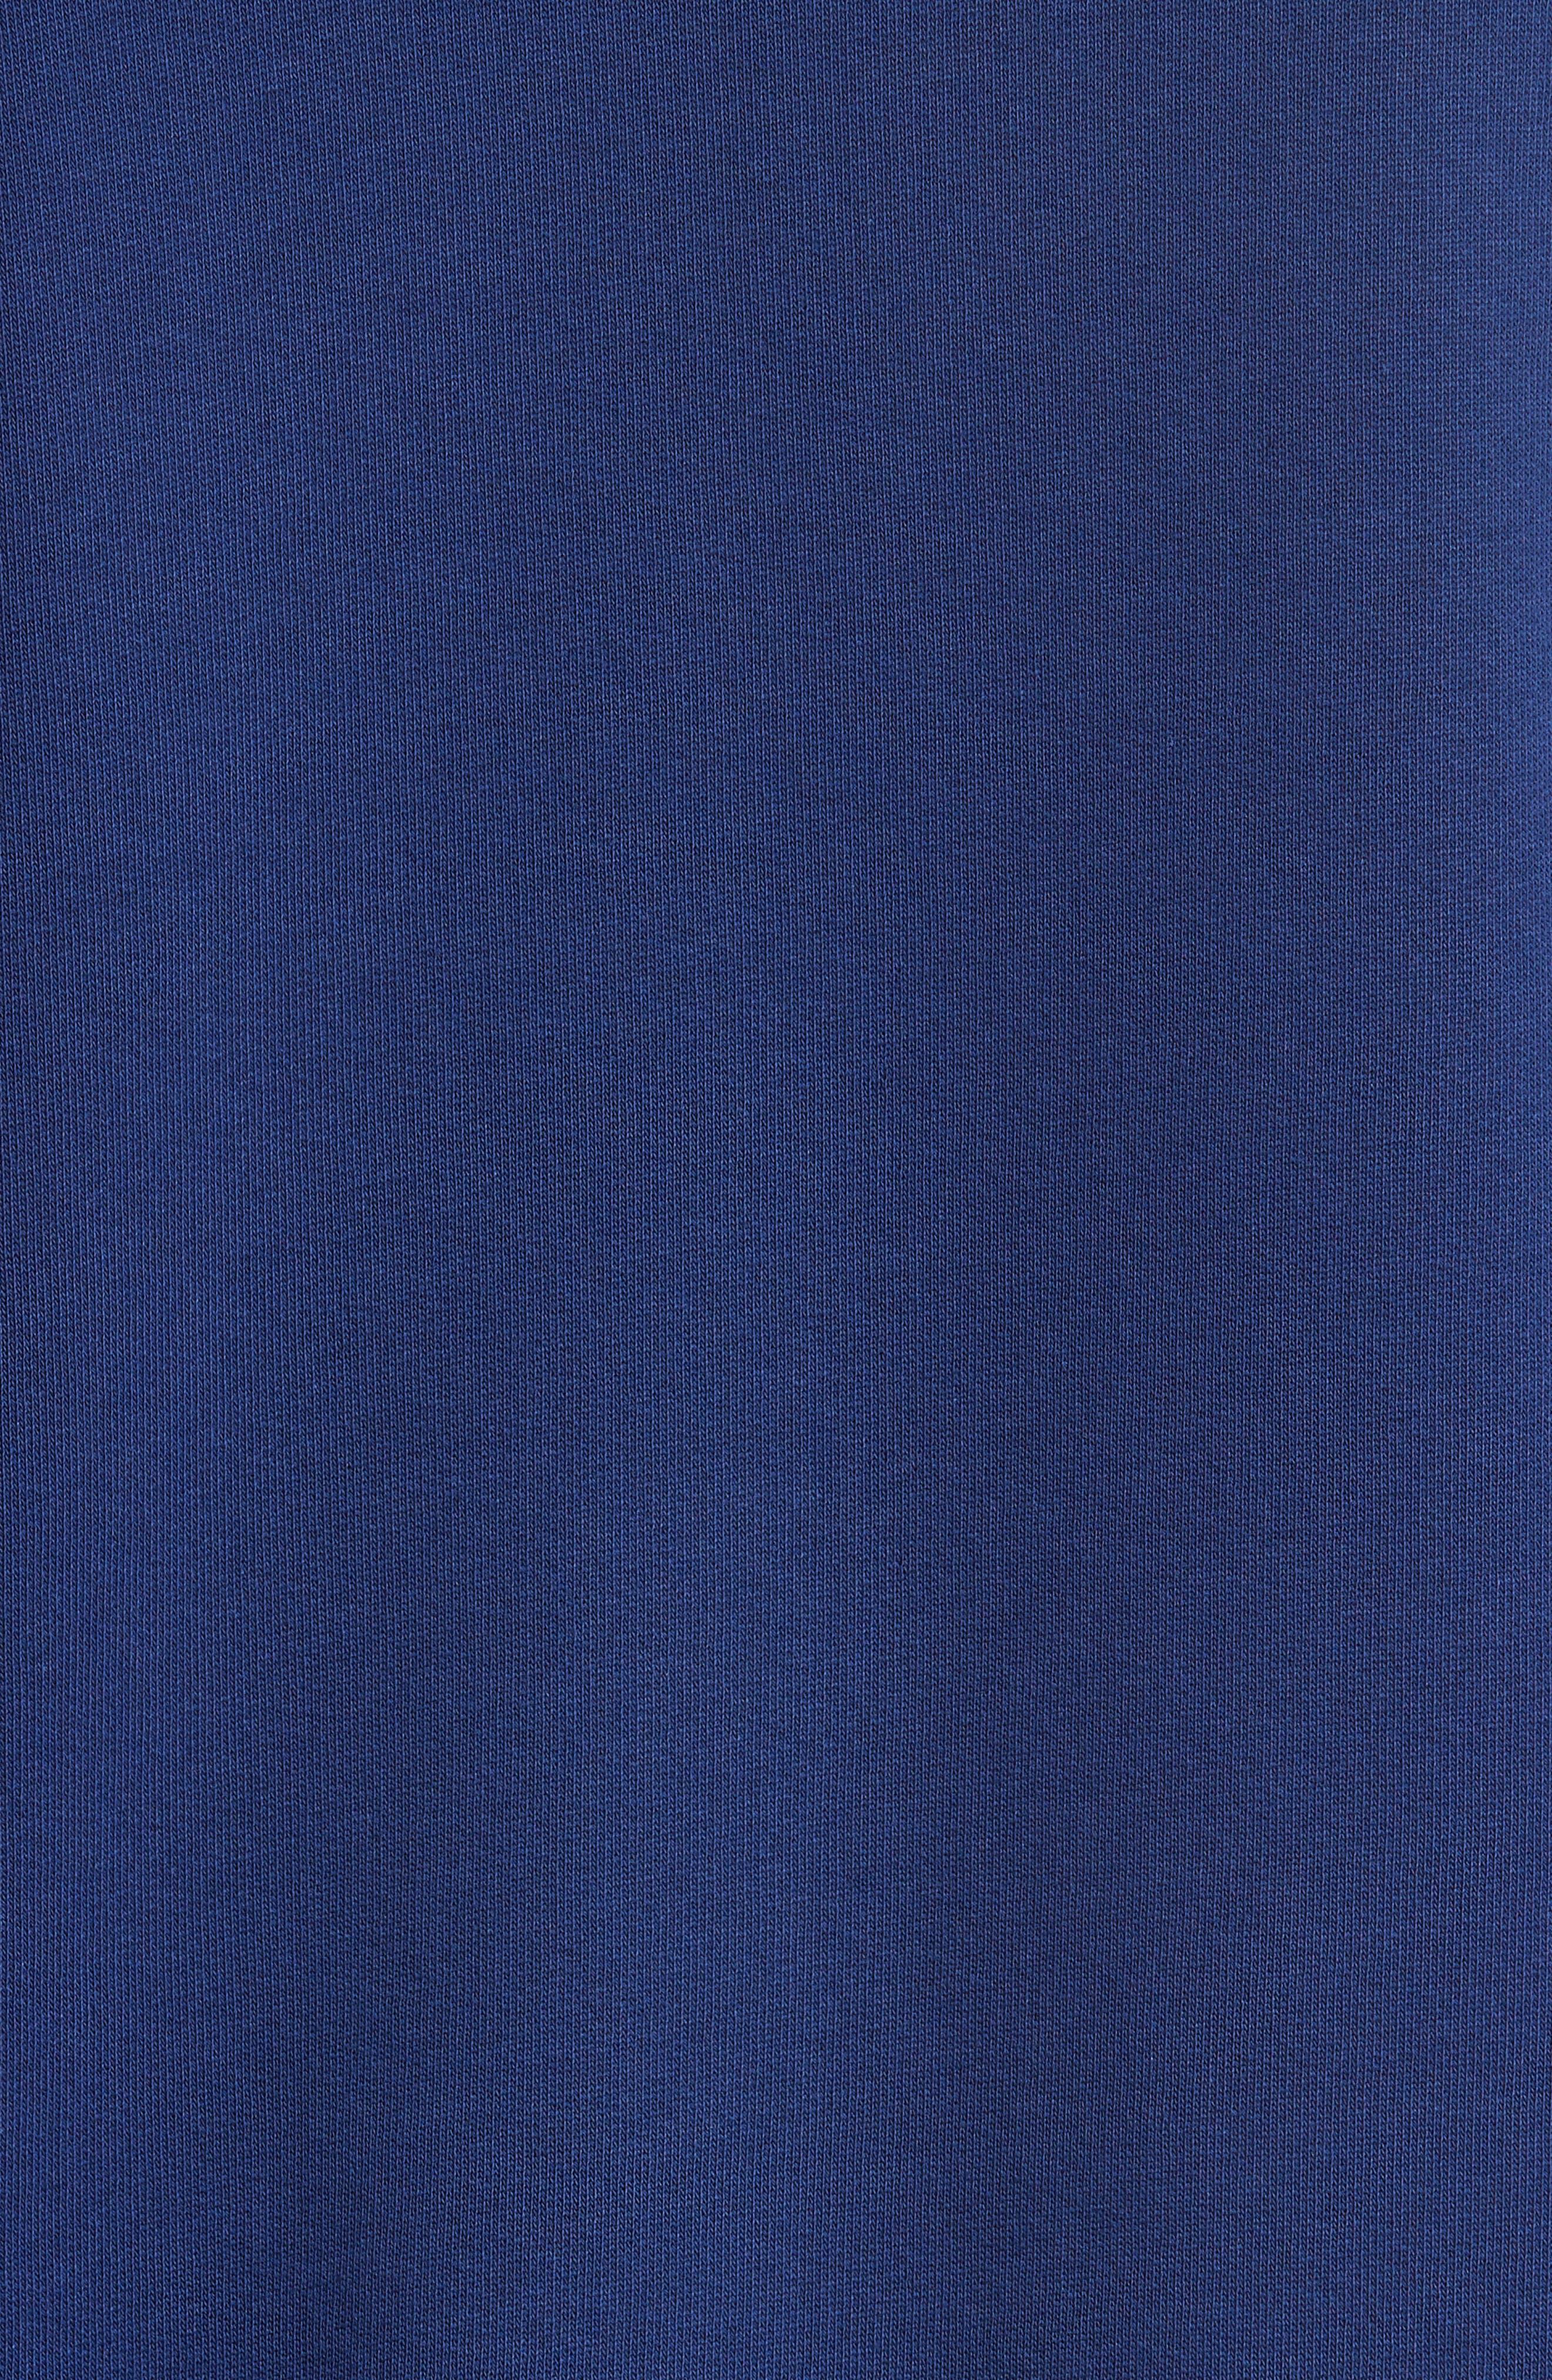 Embroidered Crewneck Sweatshirt,                             Alternate thumbnail 5, color,                             Blue